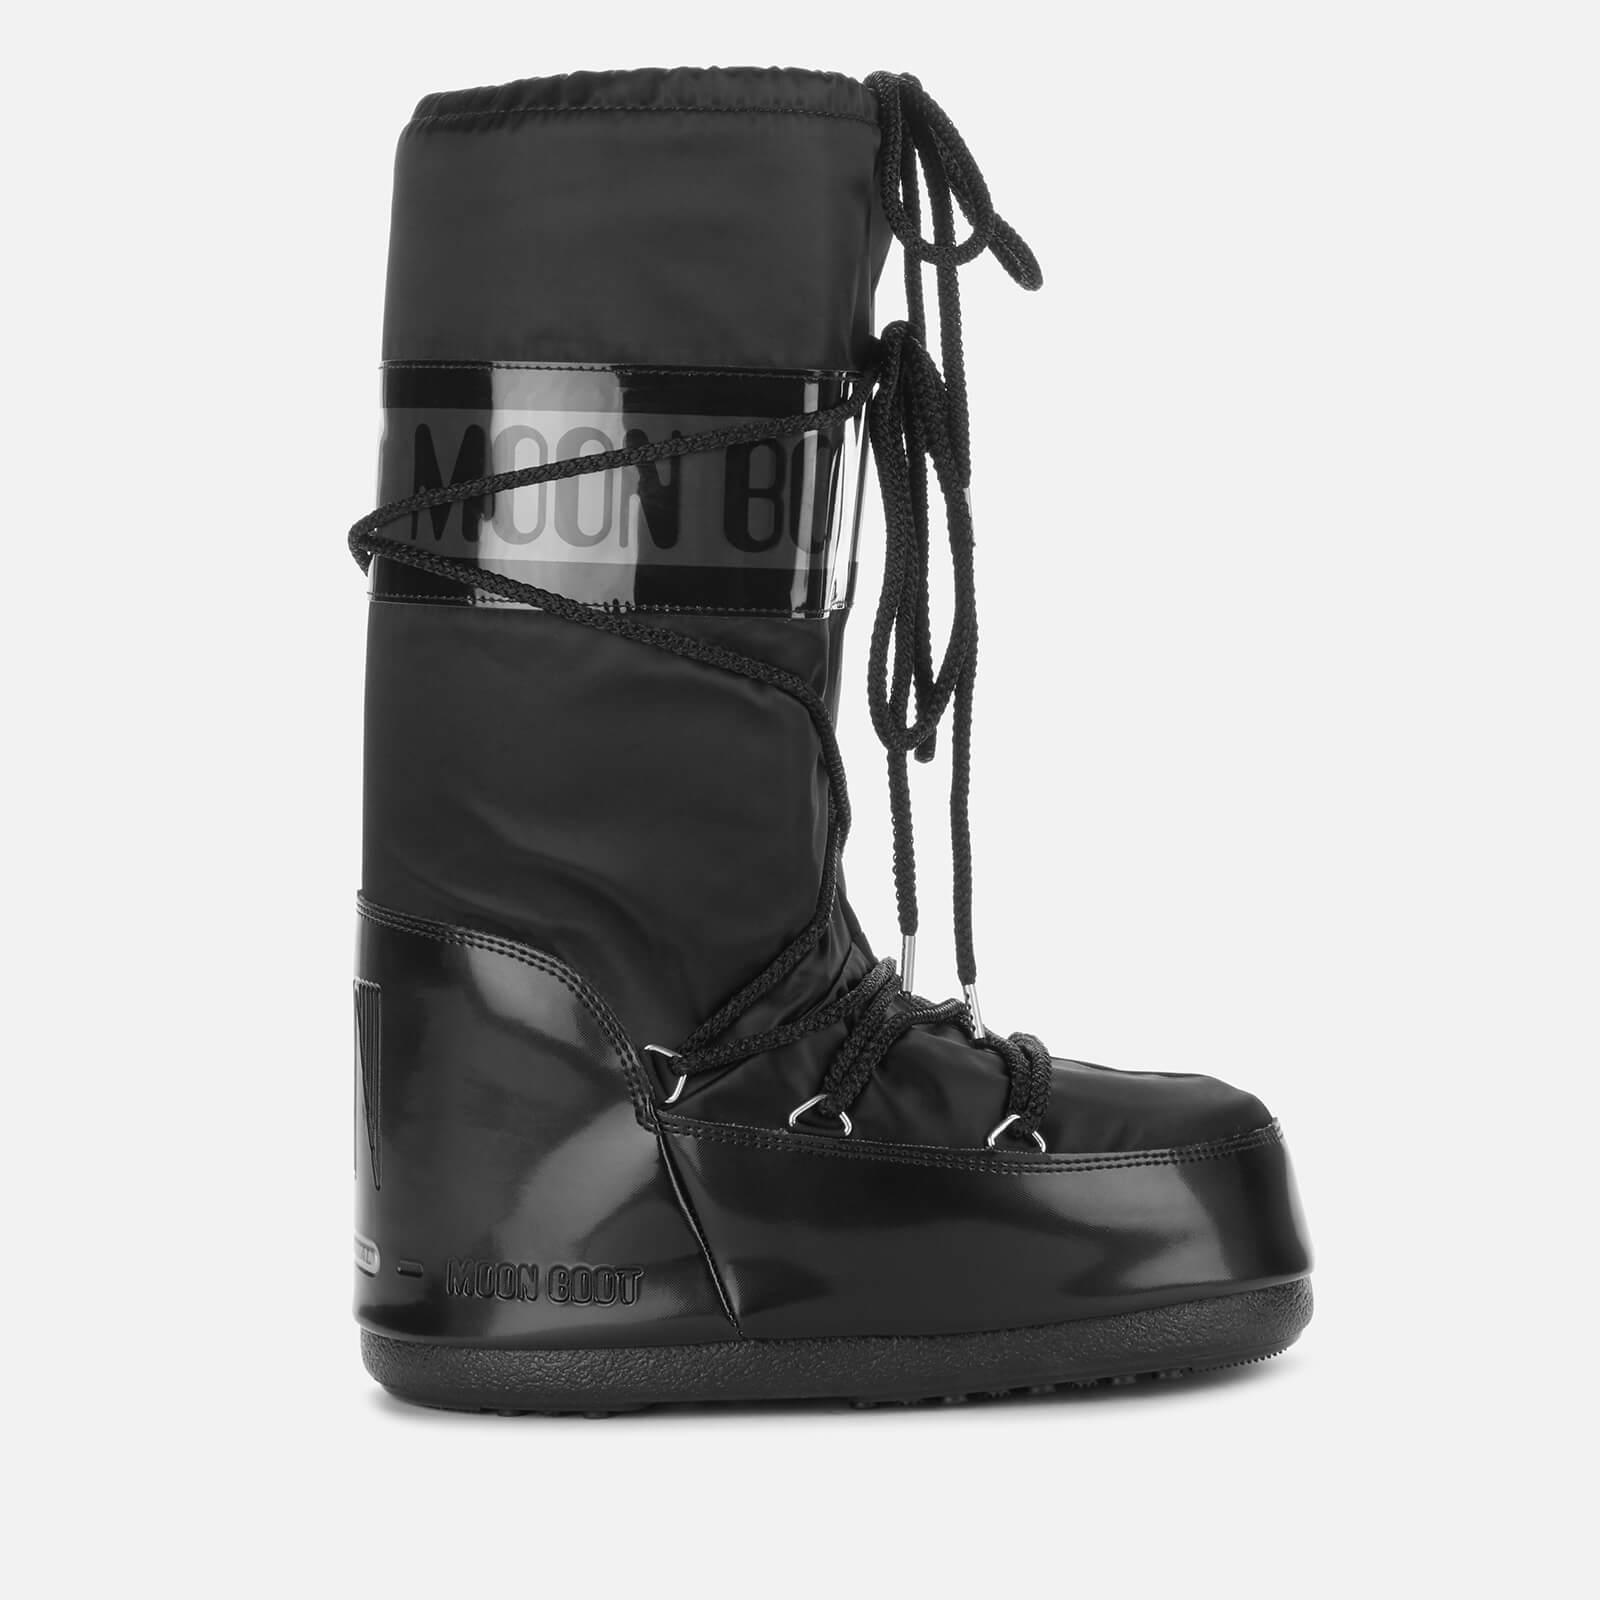 Moon Boot Women's Glance Boots - Black - EU 35-38